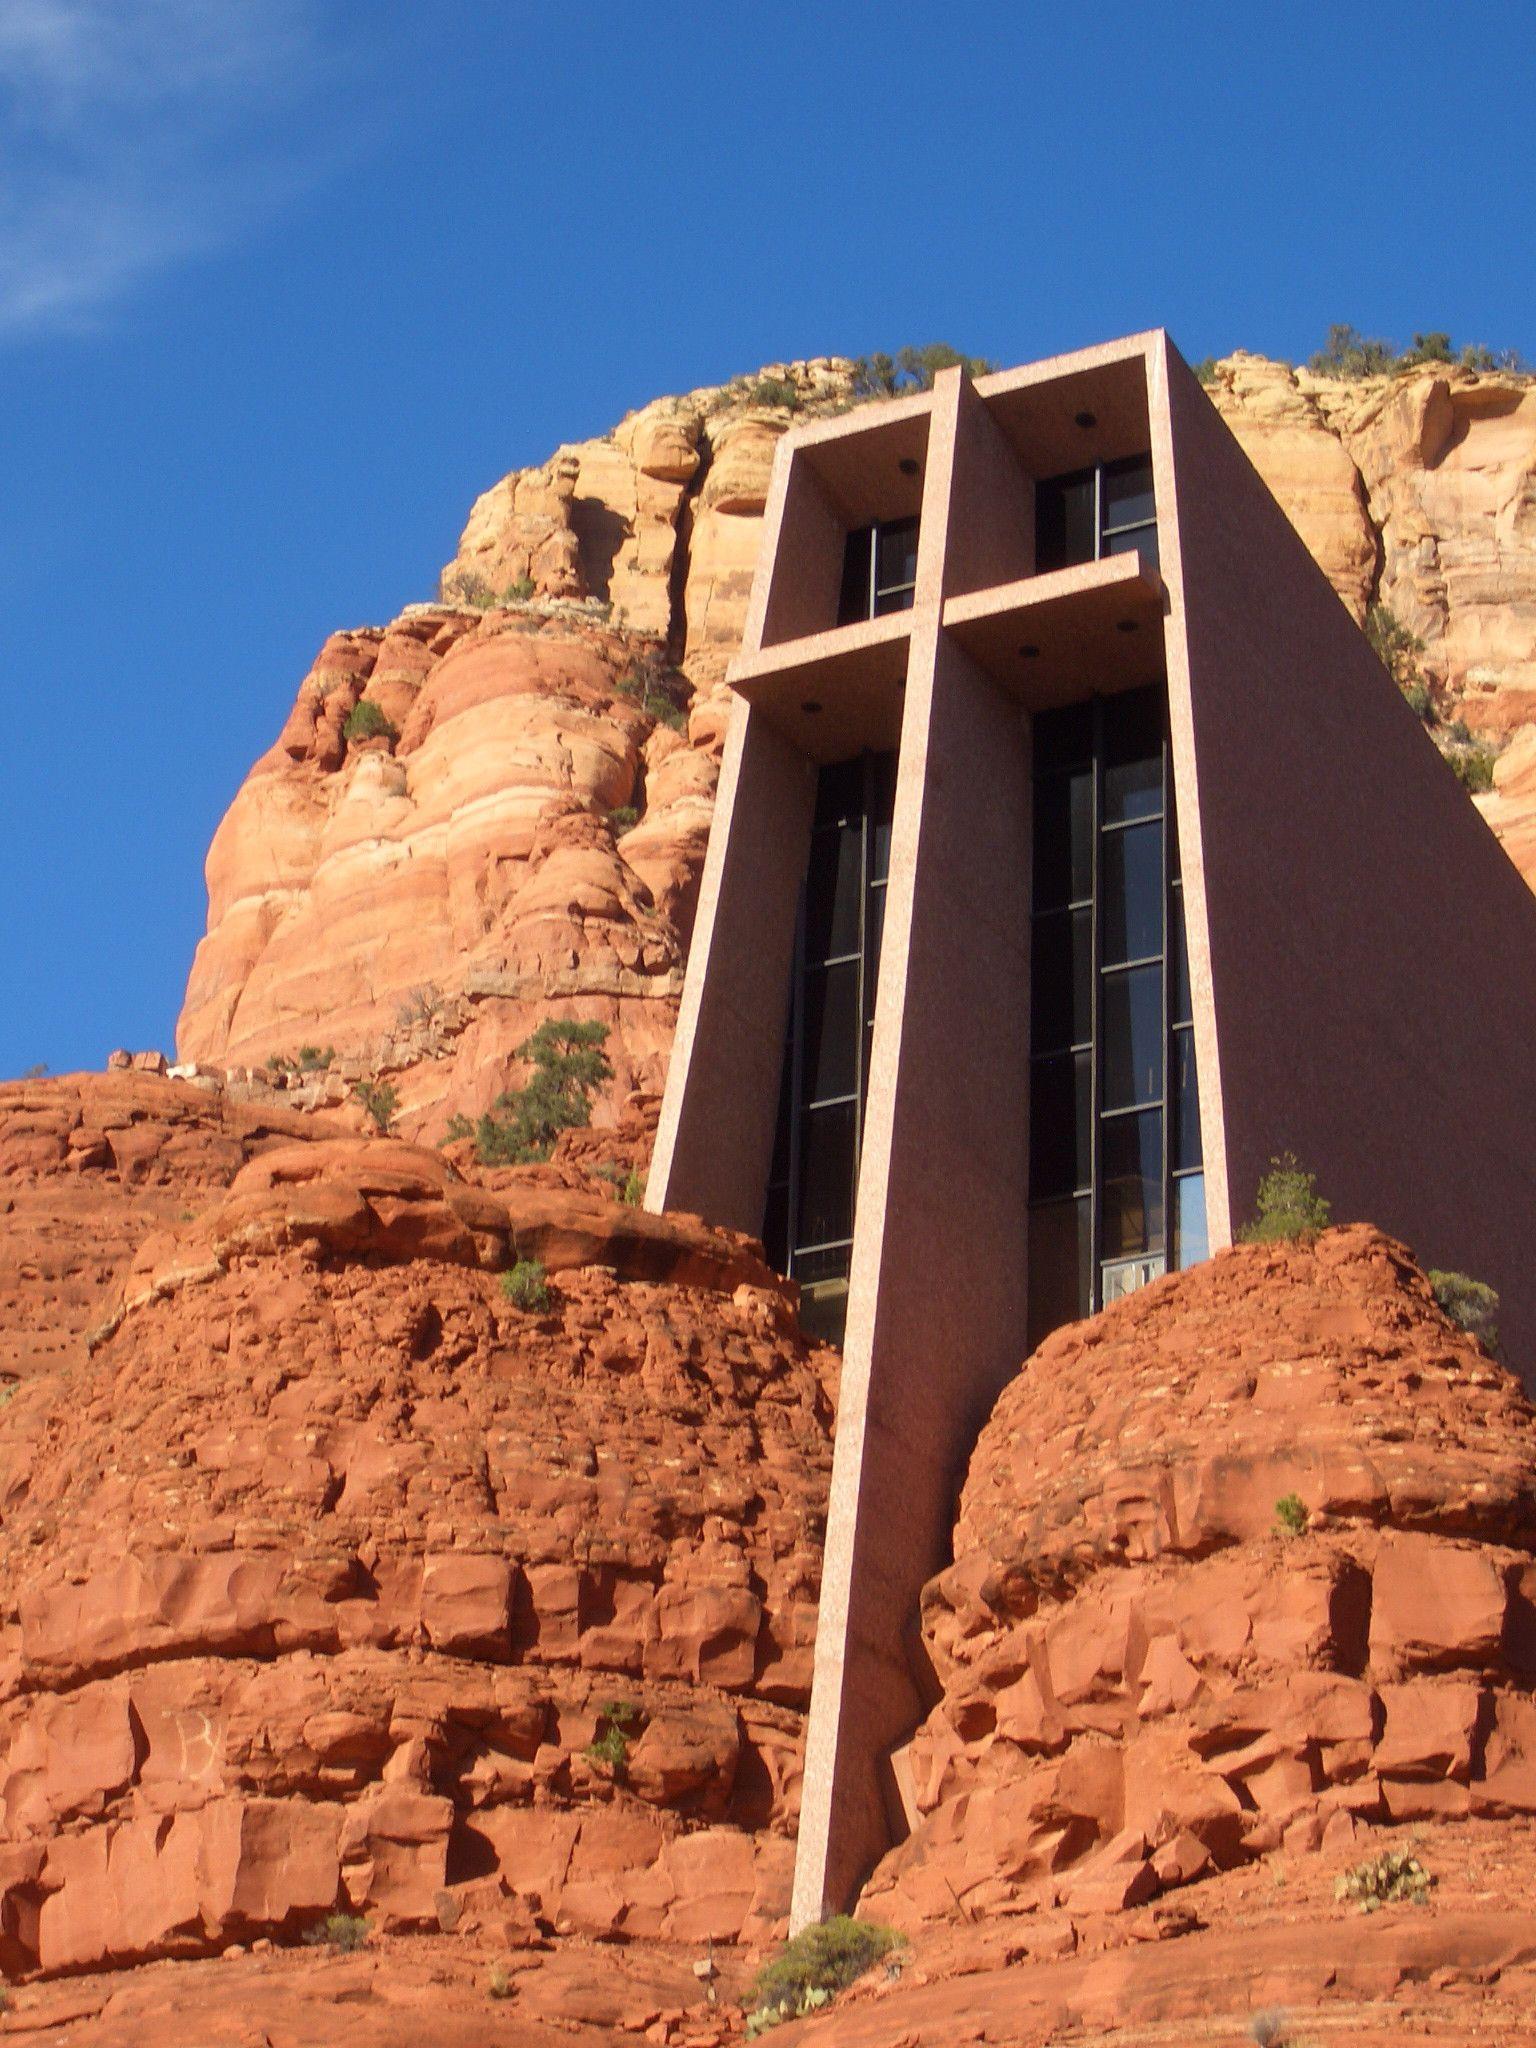 Chapel in the Rock (Arizona, United States)